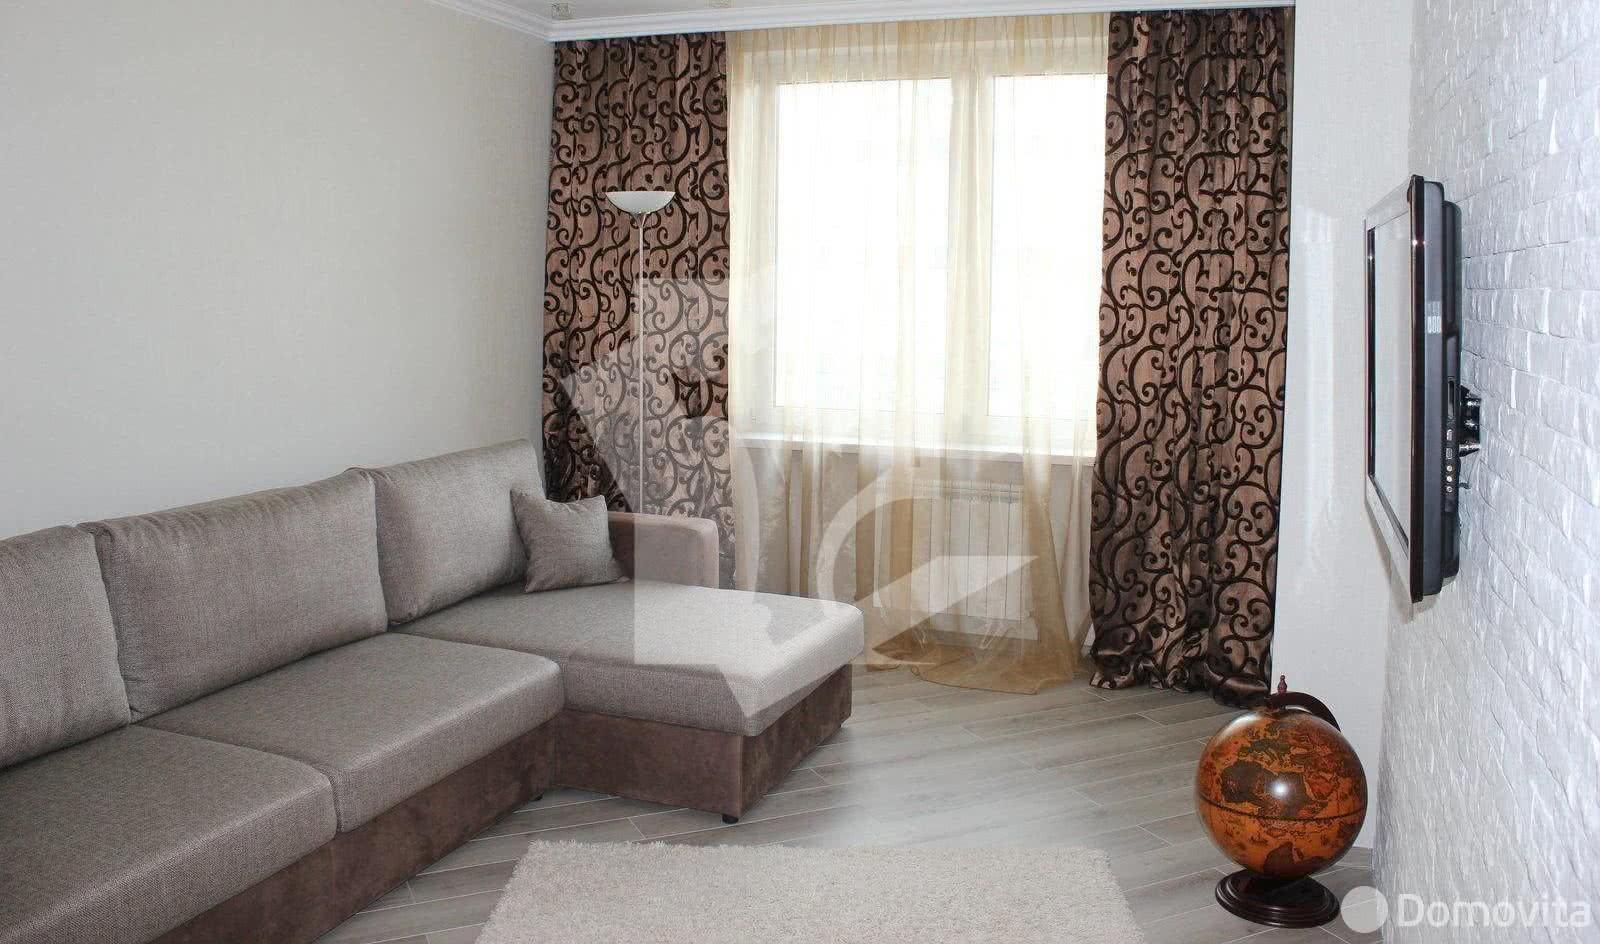 Снять 2-комнатную квартиру в Минске, ул. Скрыганова, д. 4Б - фото 1